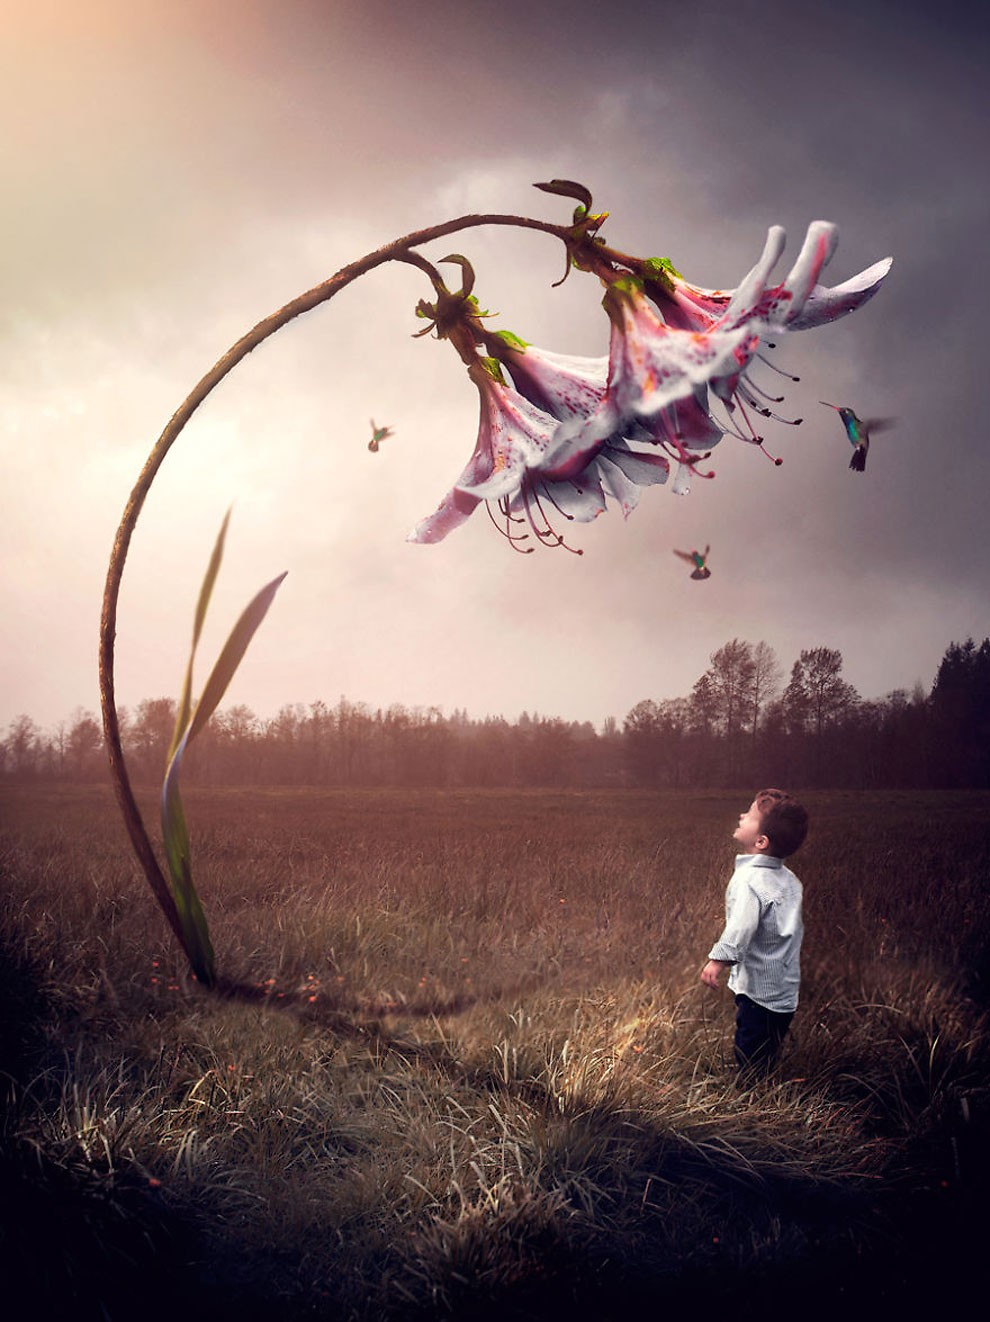 fotografia-bambini-animali-surreali-fantasy-gabriel-tomoiaga-06